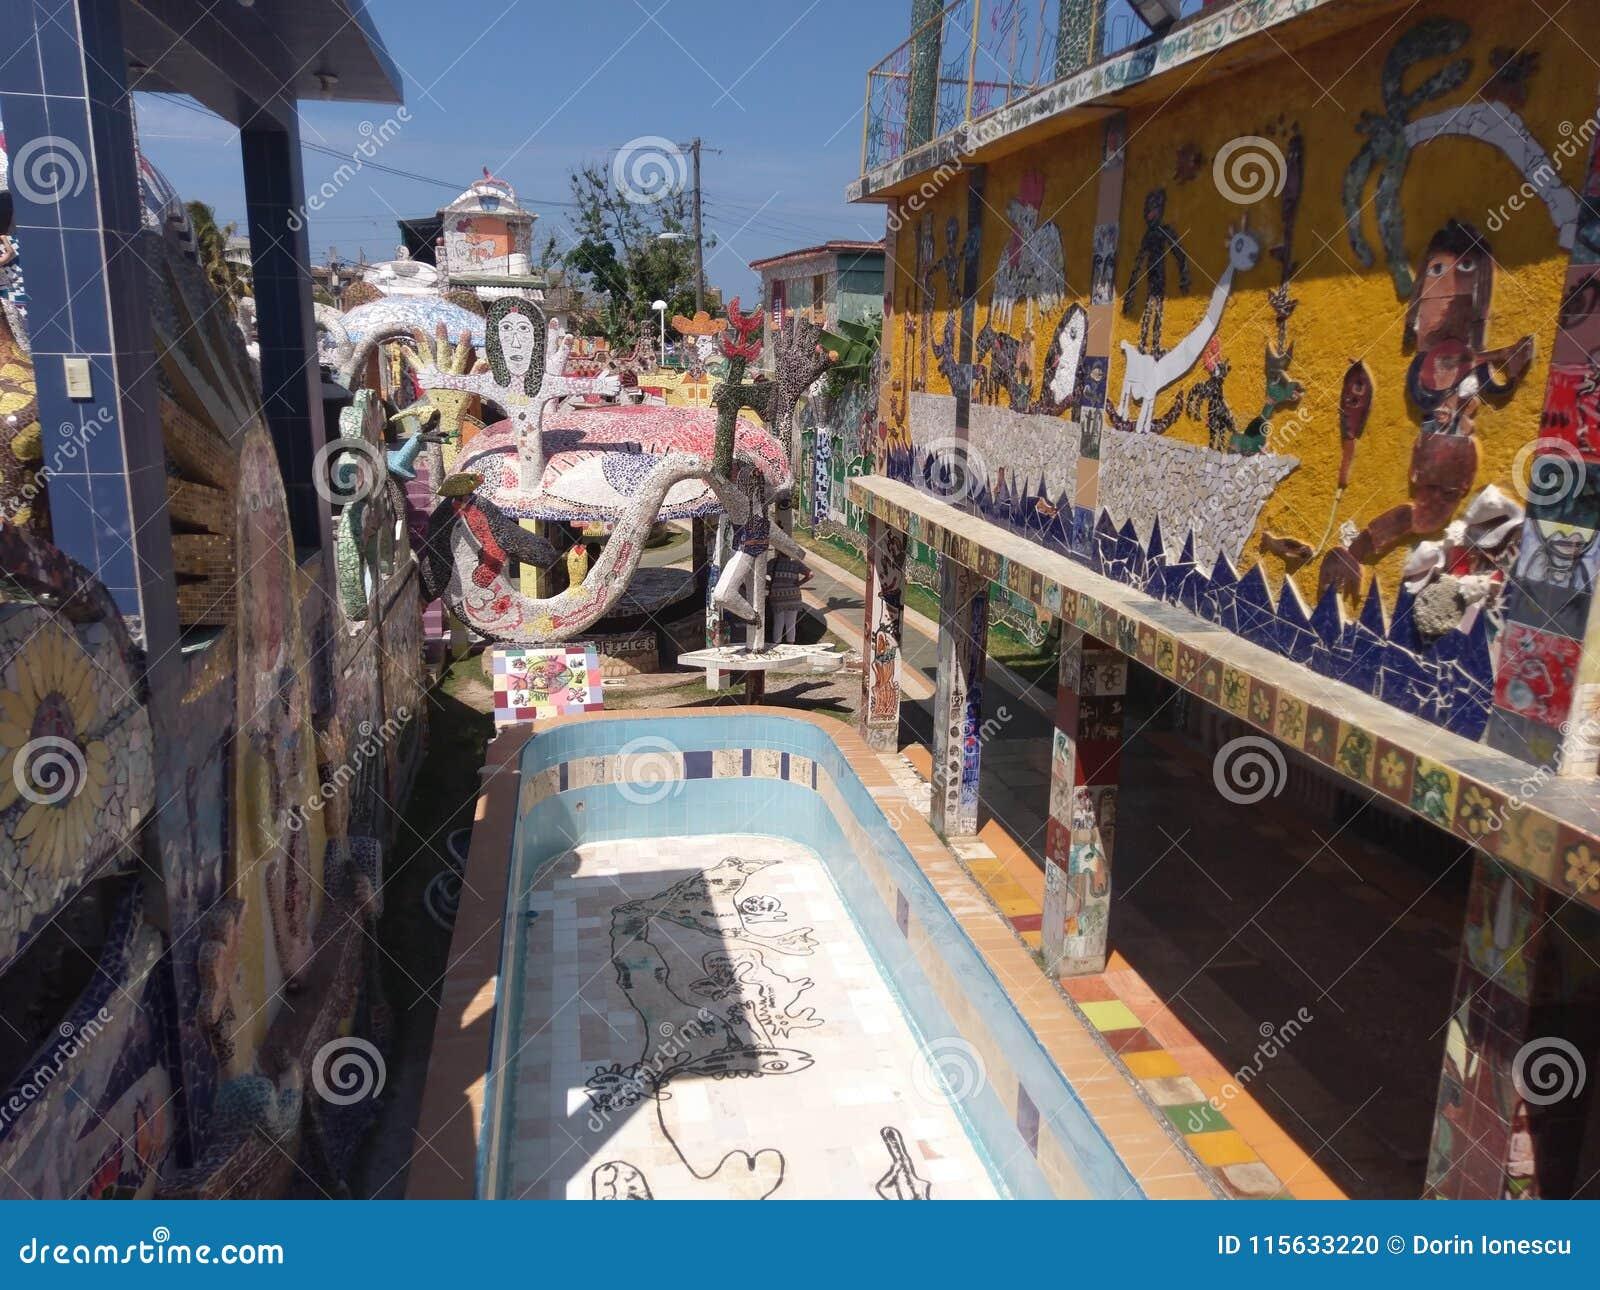 mural, recreation, tourism, bobsled, bobsleigh, bob, dock, dockage, docking facility, gondola, pier